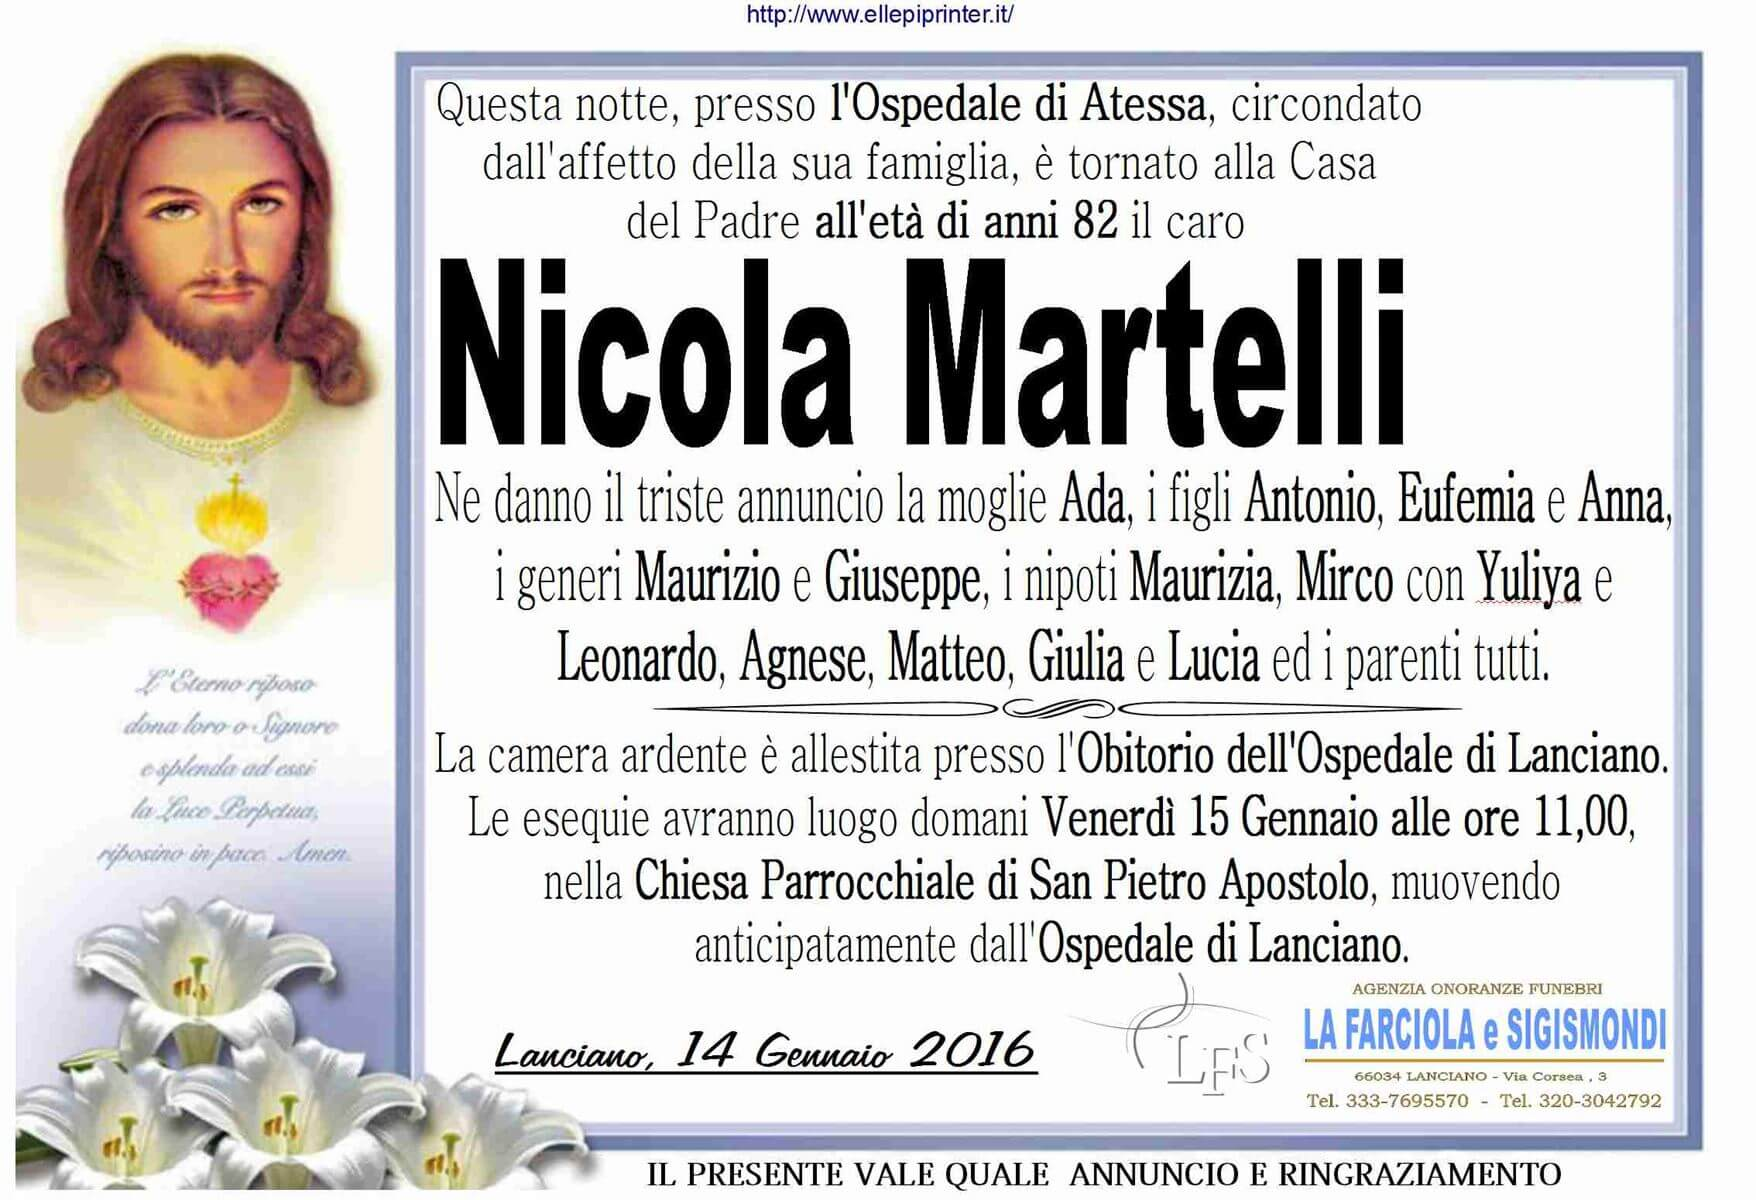 MANIFESTO MARTELLI NICOLA